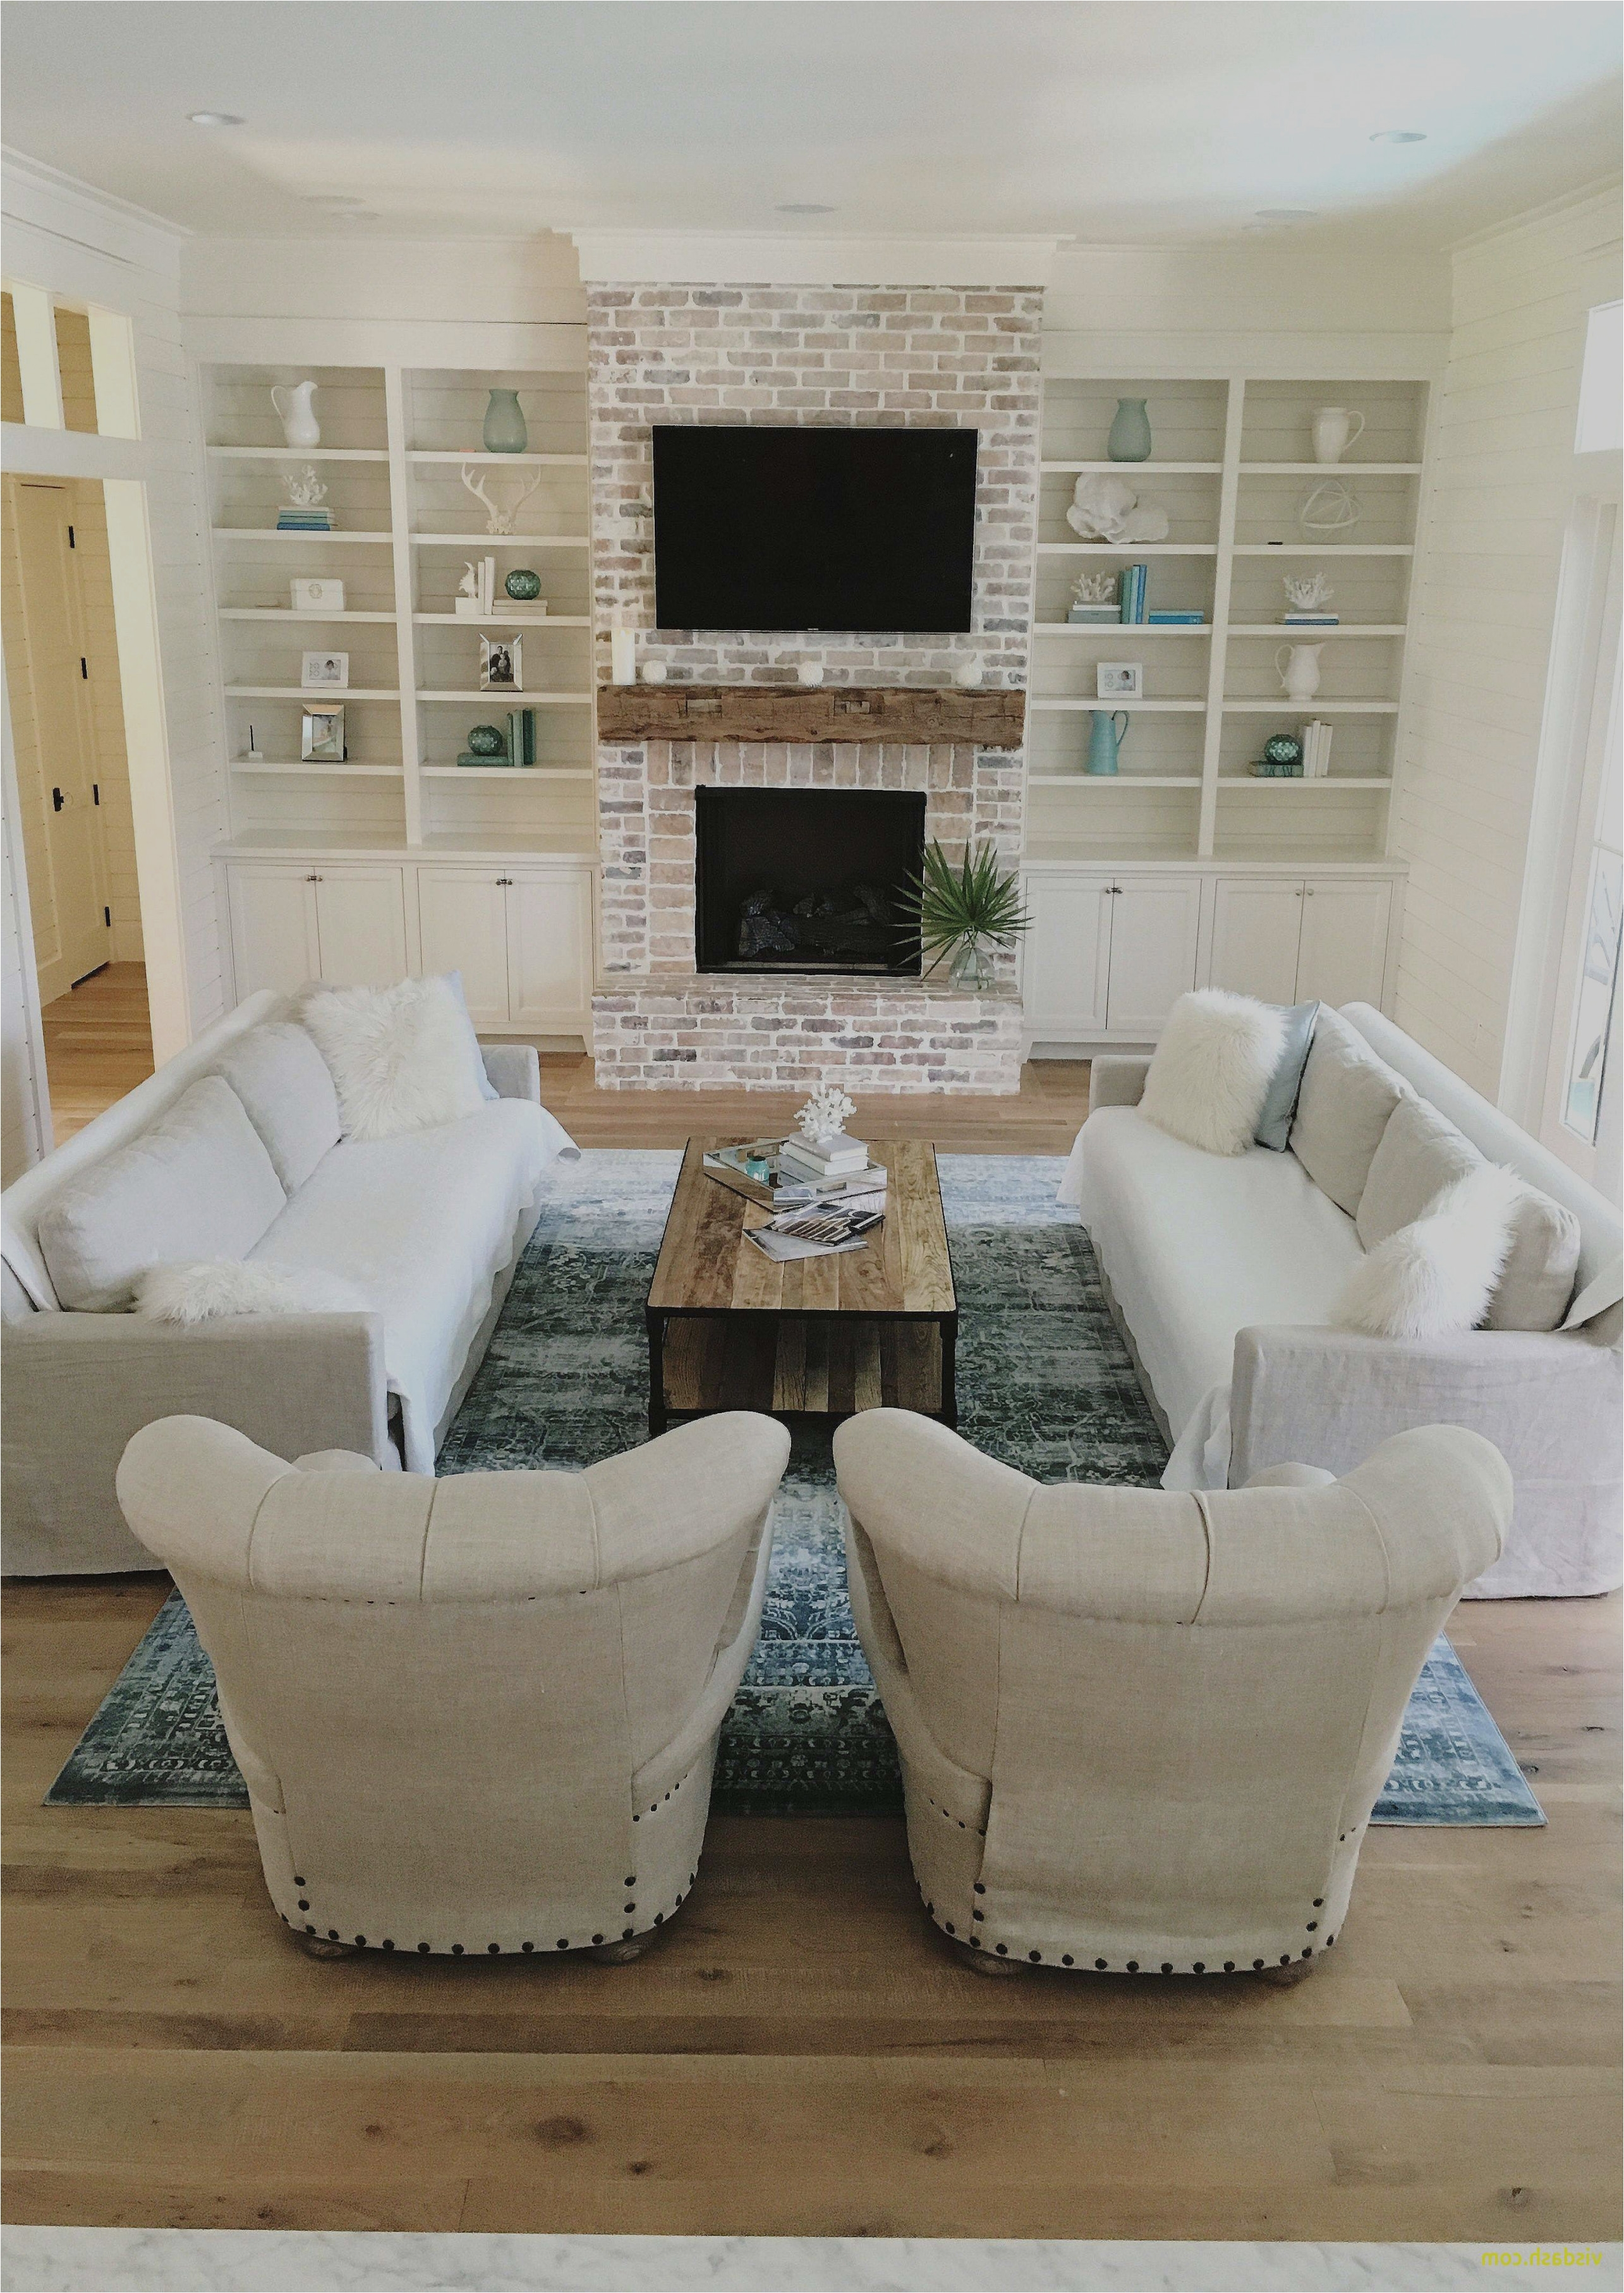 furniture stores in living room design elements fresh modern living room furniture new gunstige sofa macys